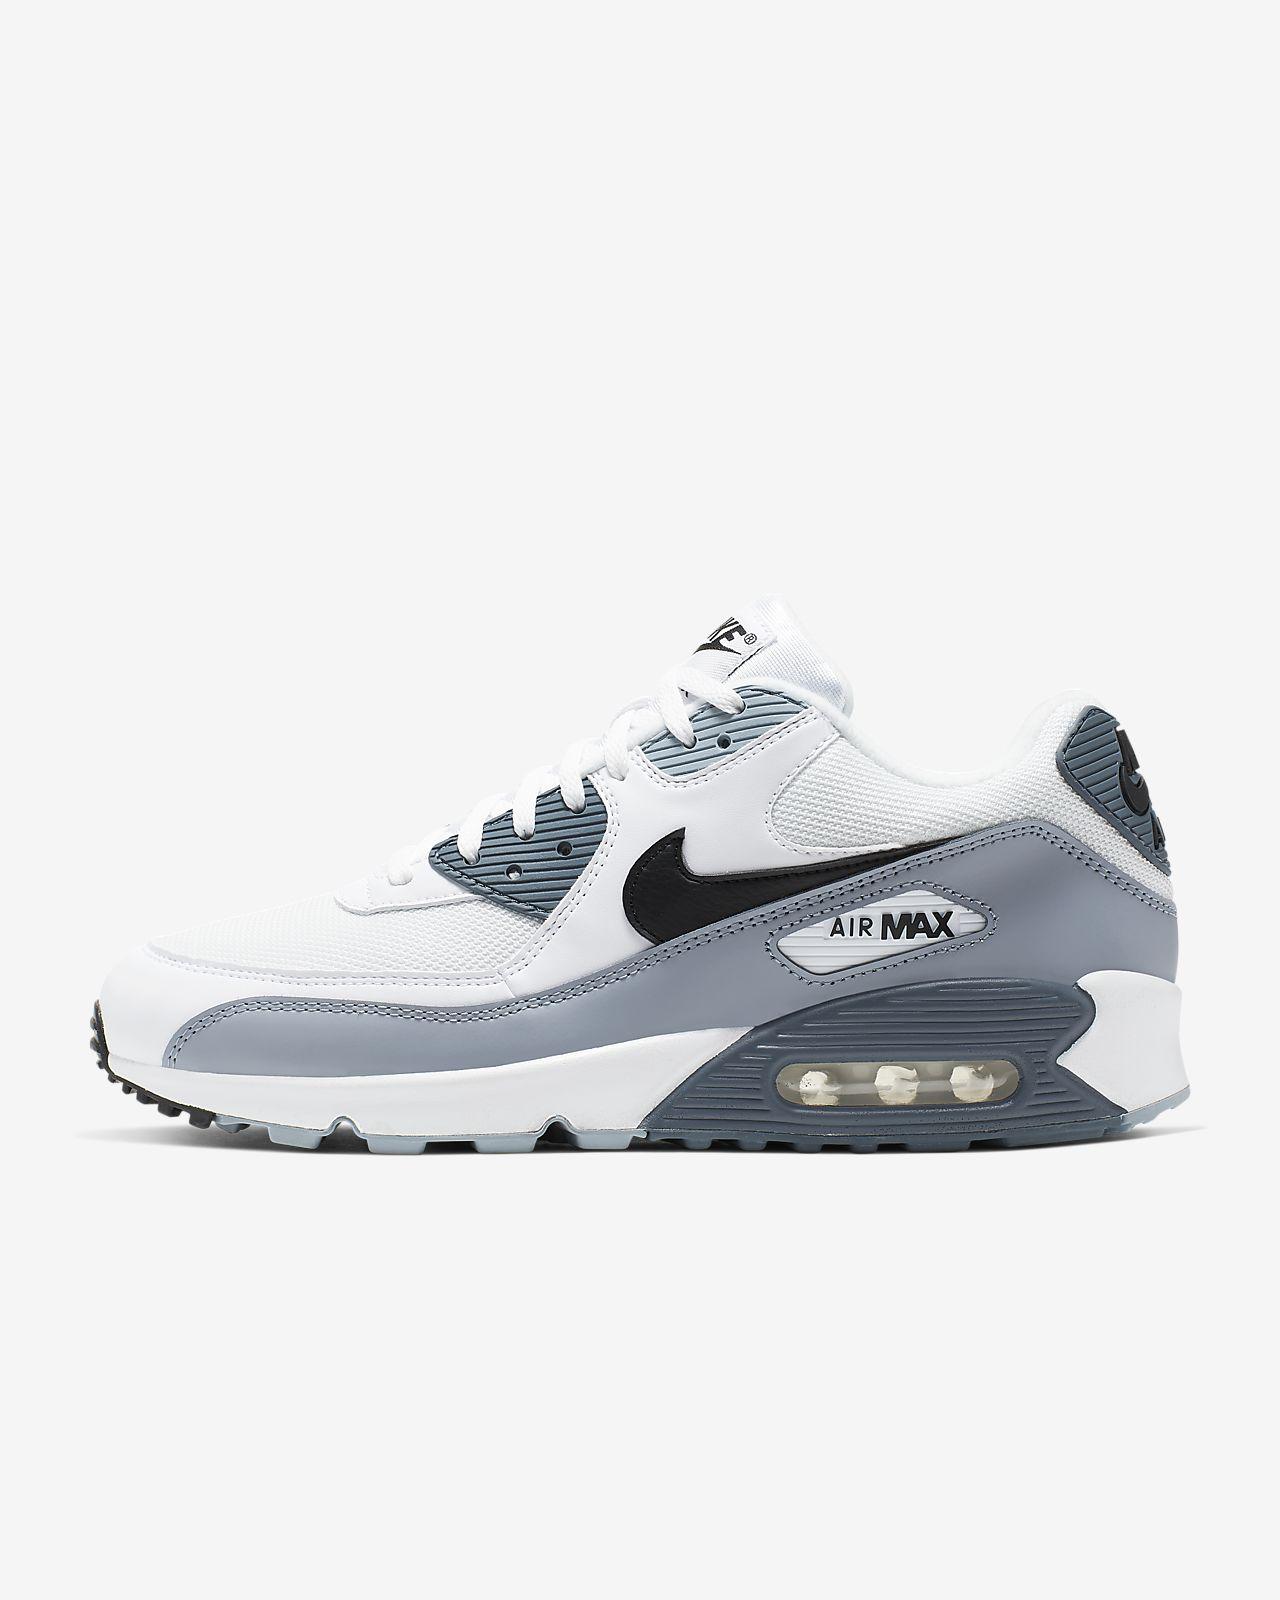 save off 0c145 88f0b ... Skon Nike Air Max 90 Essential för män